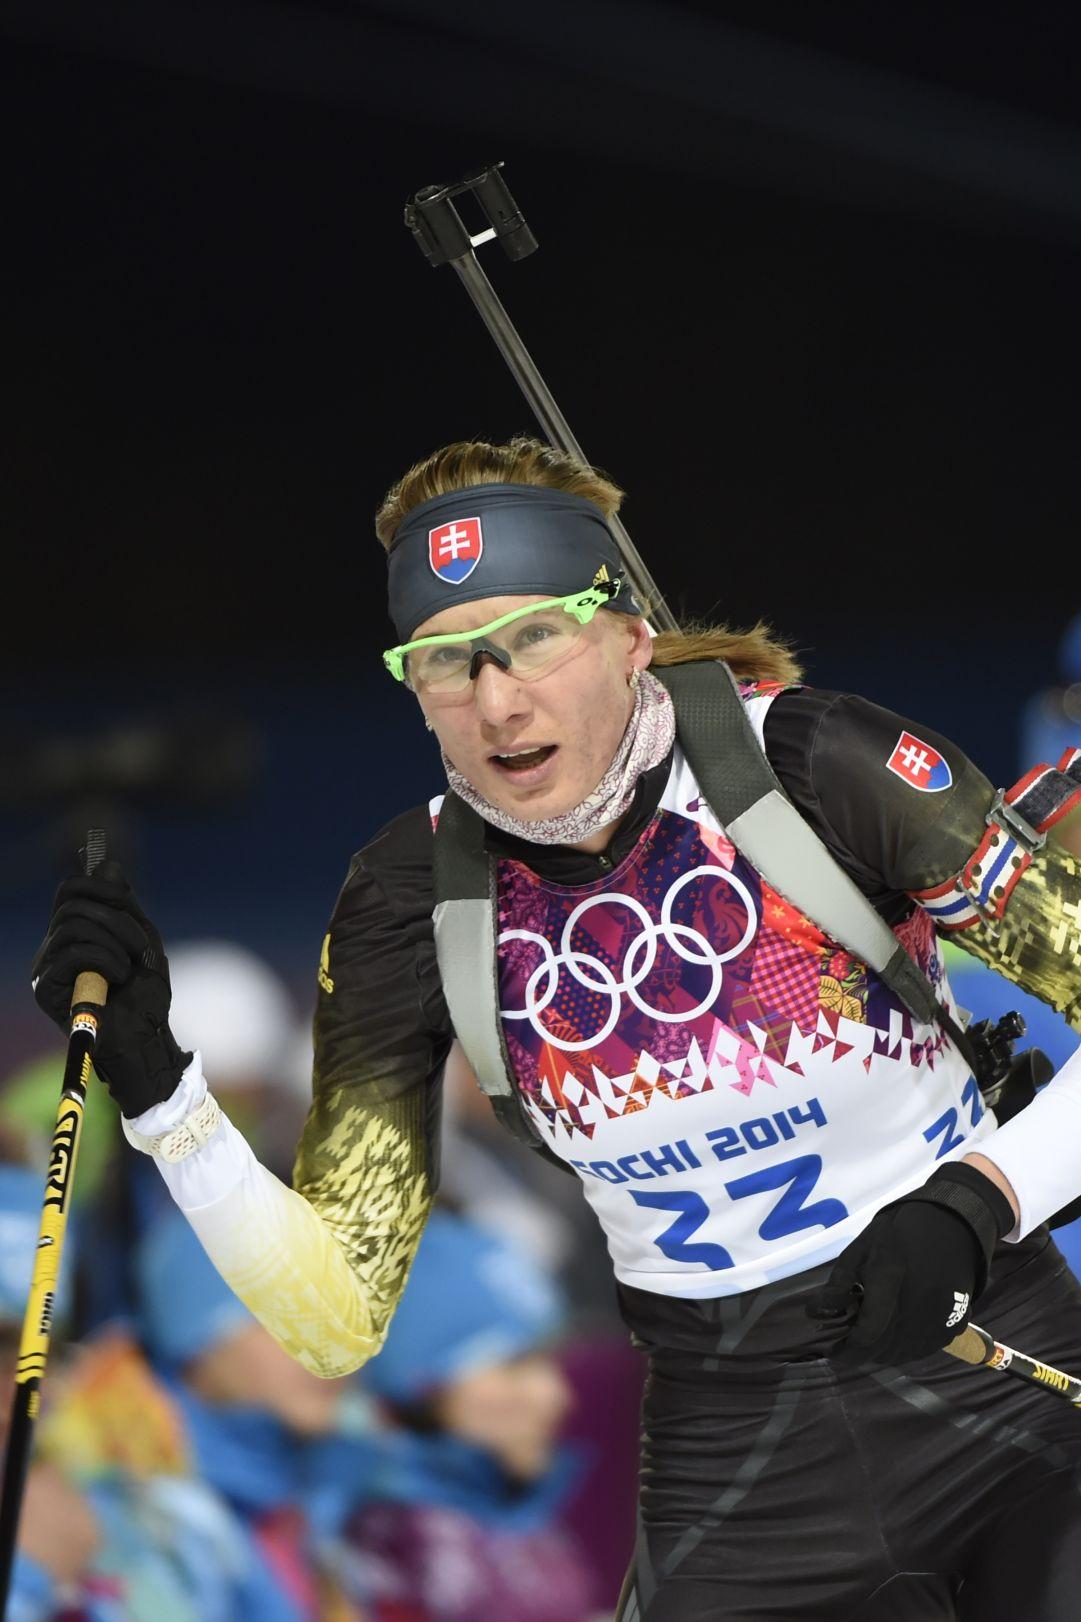 Anastasiya Kuzmina scrive la storia. L'Italia flirta con la medaglia: 4^ Oberhofer, 6^ Wierer